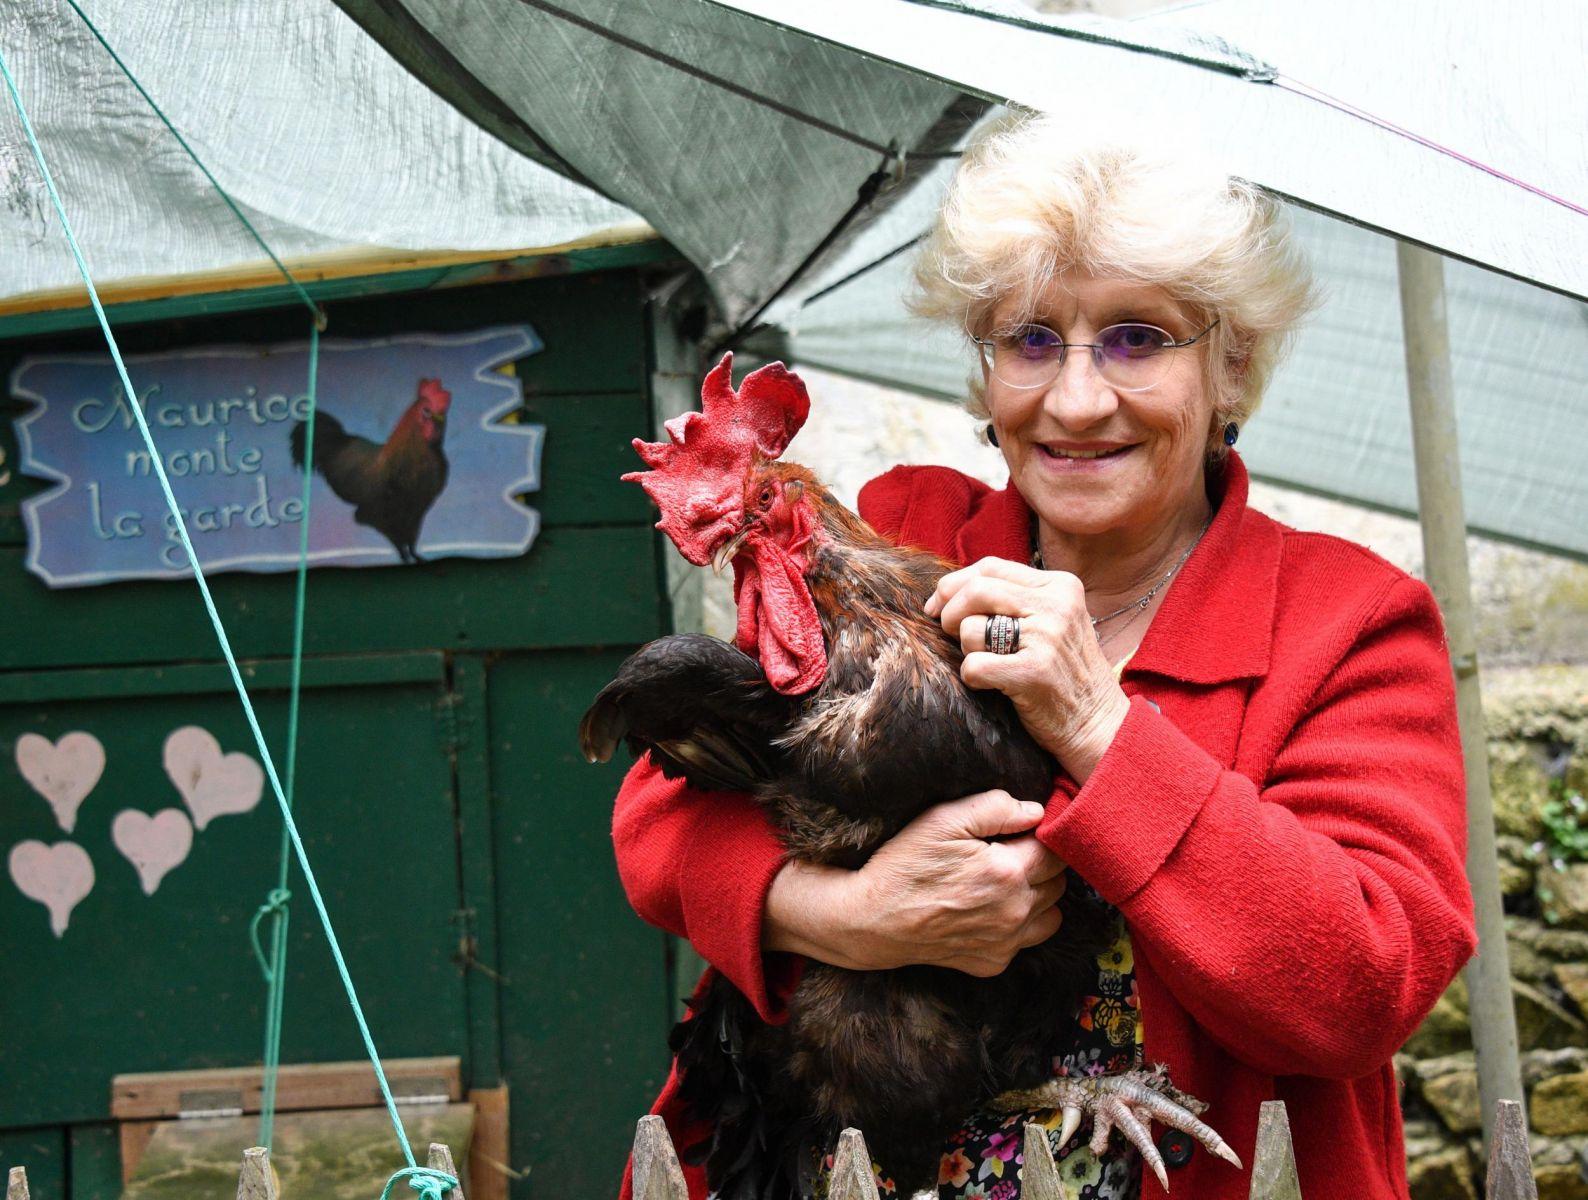 Aneh, Ada Ayam Jago Diadili Sebab Berkokok Kencang dan Kepagian!